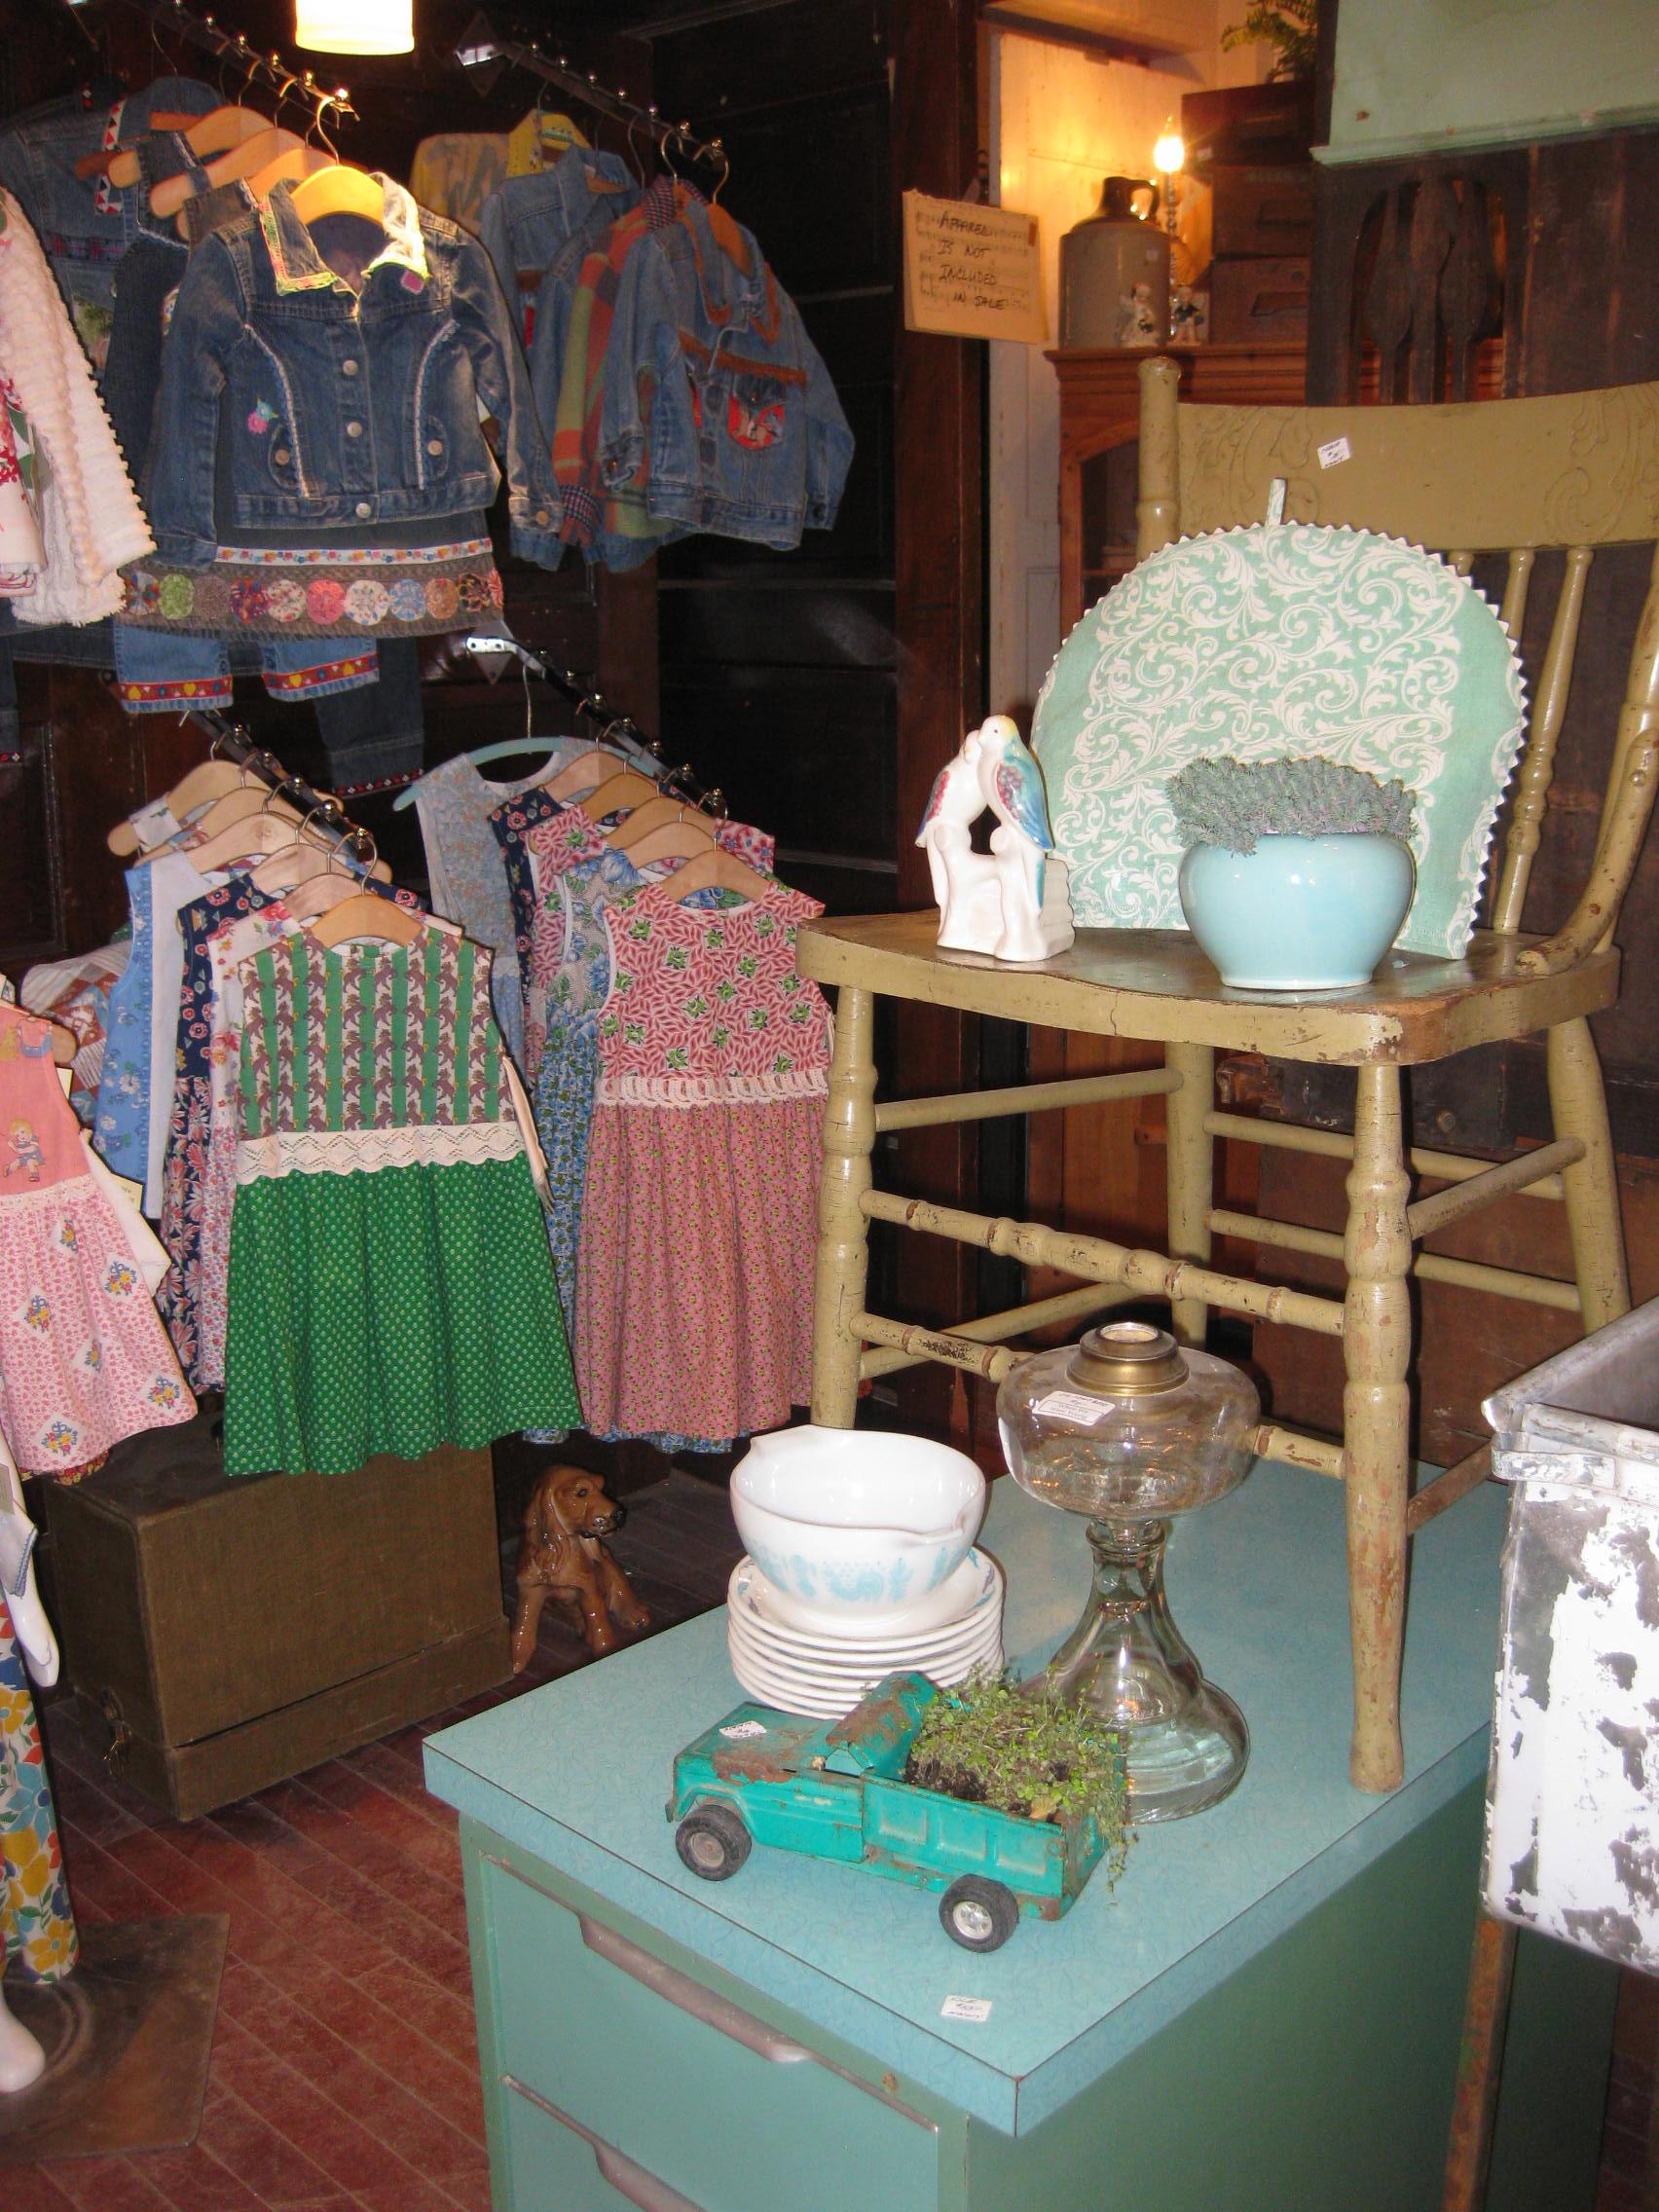 Grandma Alert - Sweet Kids Clothes at Shop 501